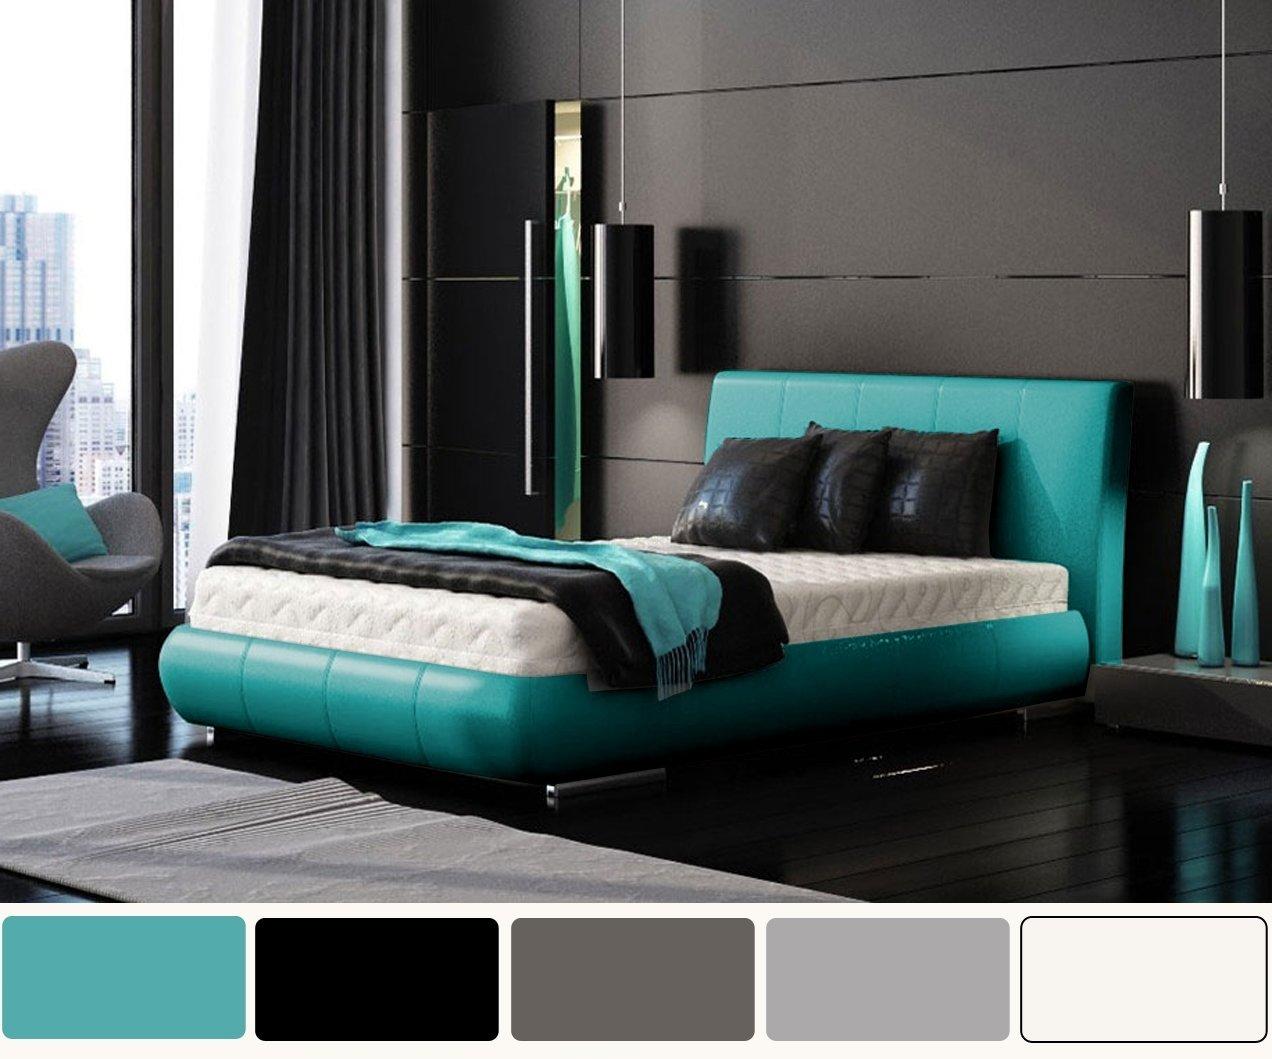 10 Lovable Blue And Black Bedroom Ideas bedroom great image of modern blue and black bedroom decoration 2020